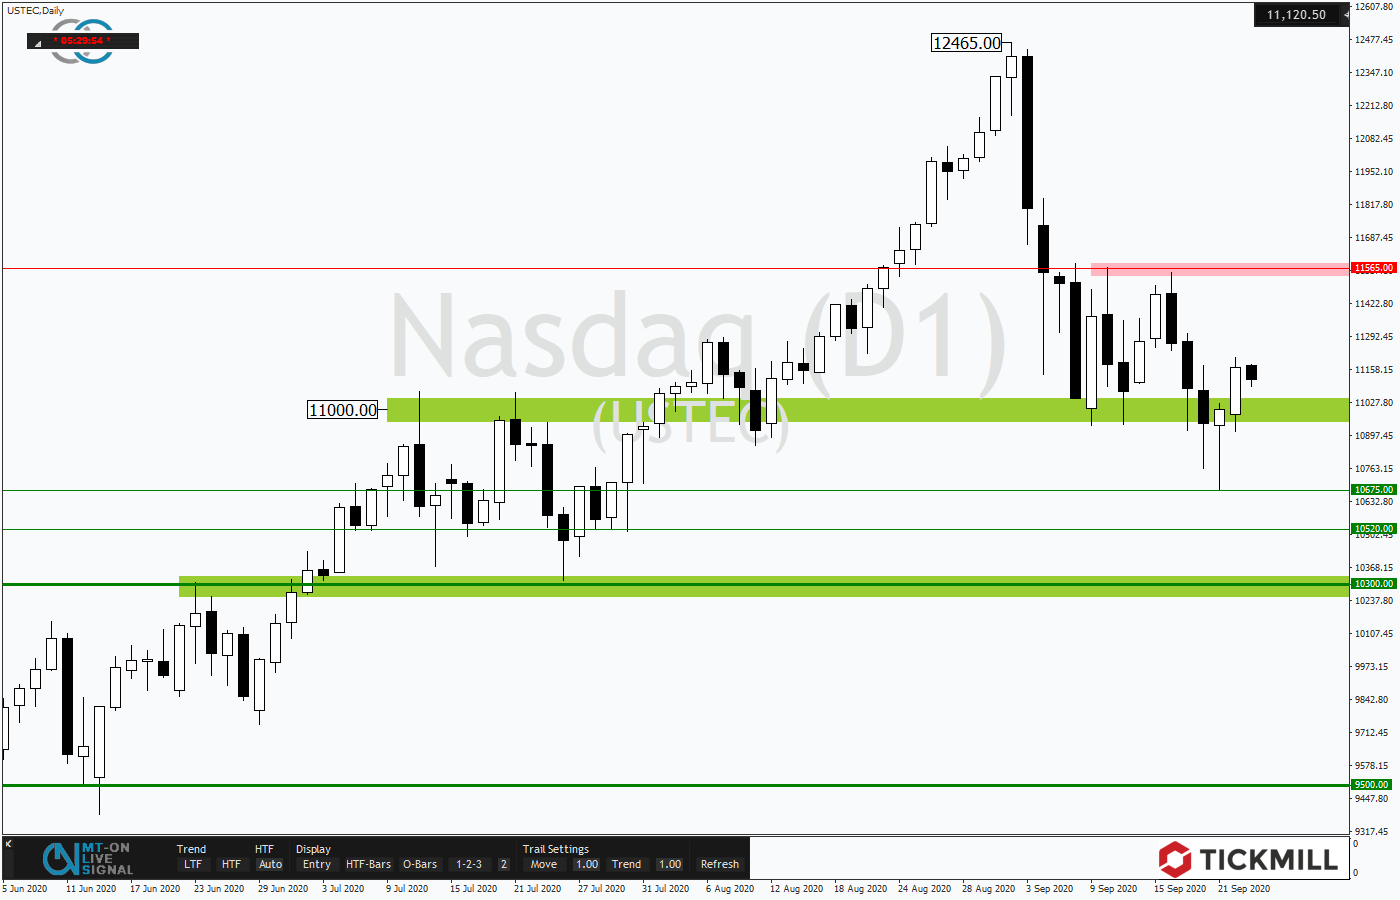 Tickmill-Analyse: NASDAQ 100 im Tageschart